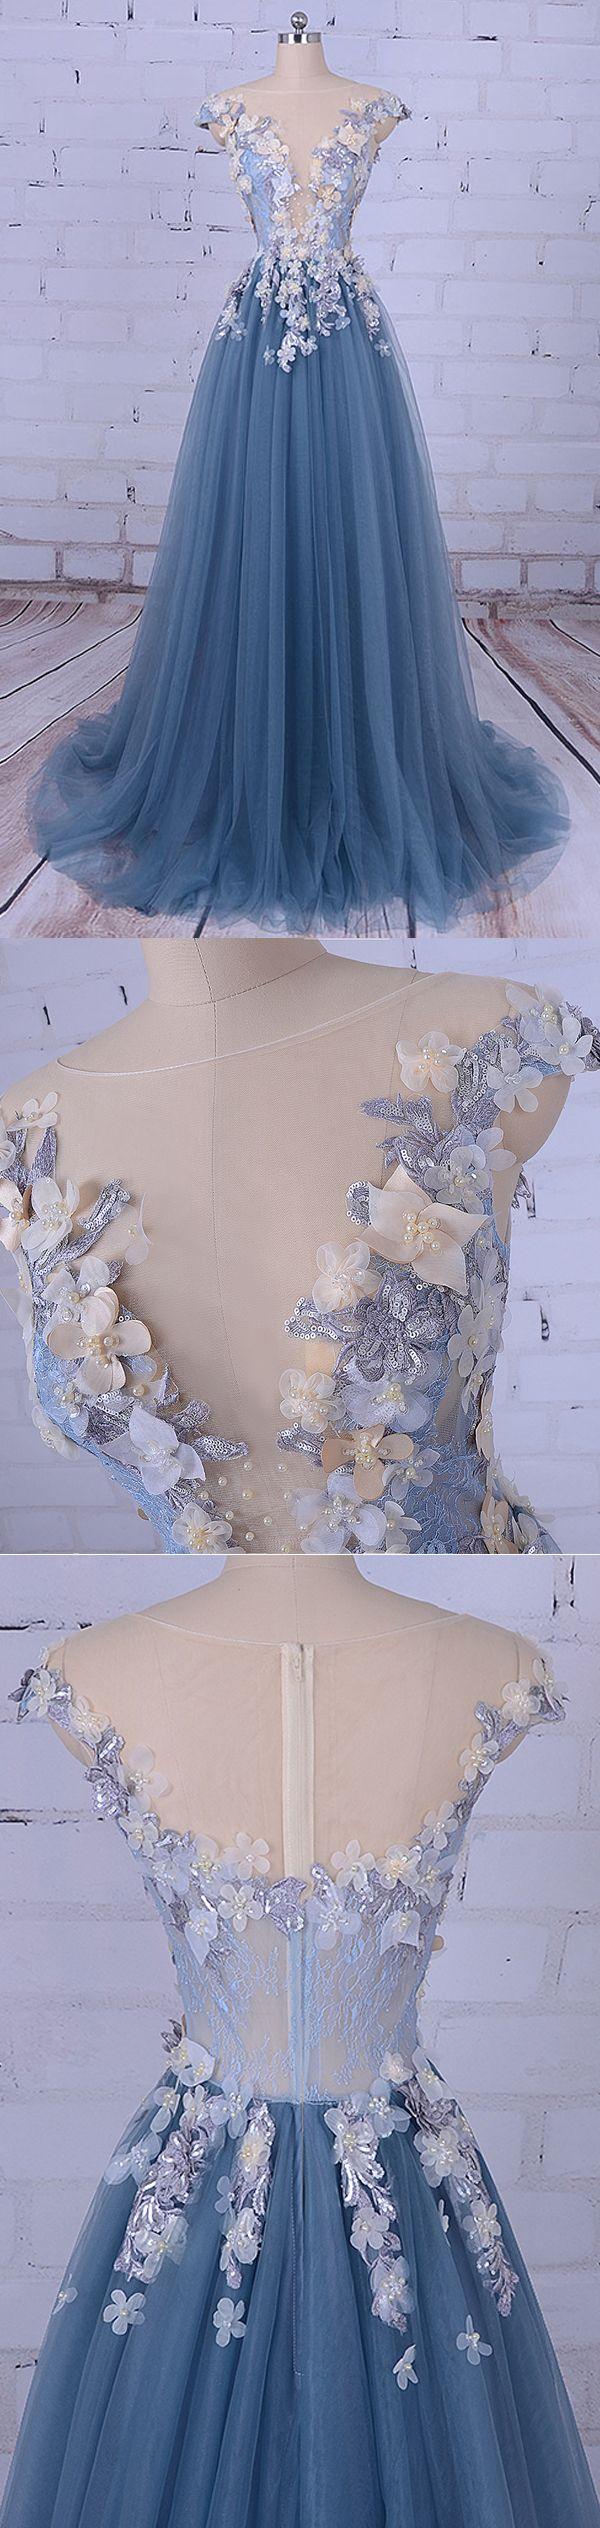 Long Prom Dresses, Sleeveless Prom Dresses, A-Line Party Prom Dresses, Tulle Prom Dresses, Applique Prom Dresses, Sexy Prom Dresses Online, LB0306